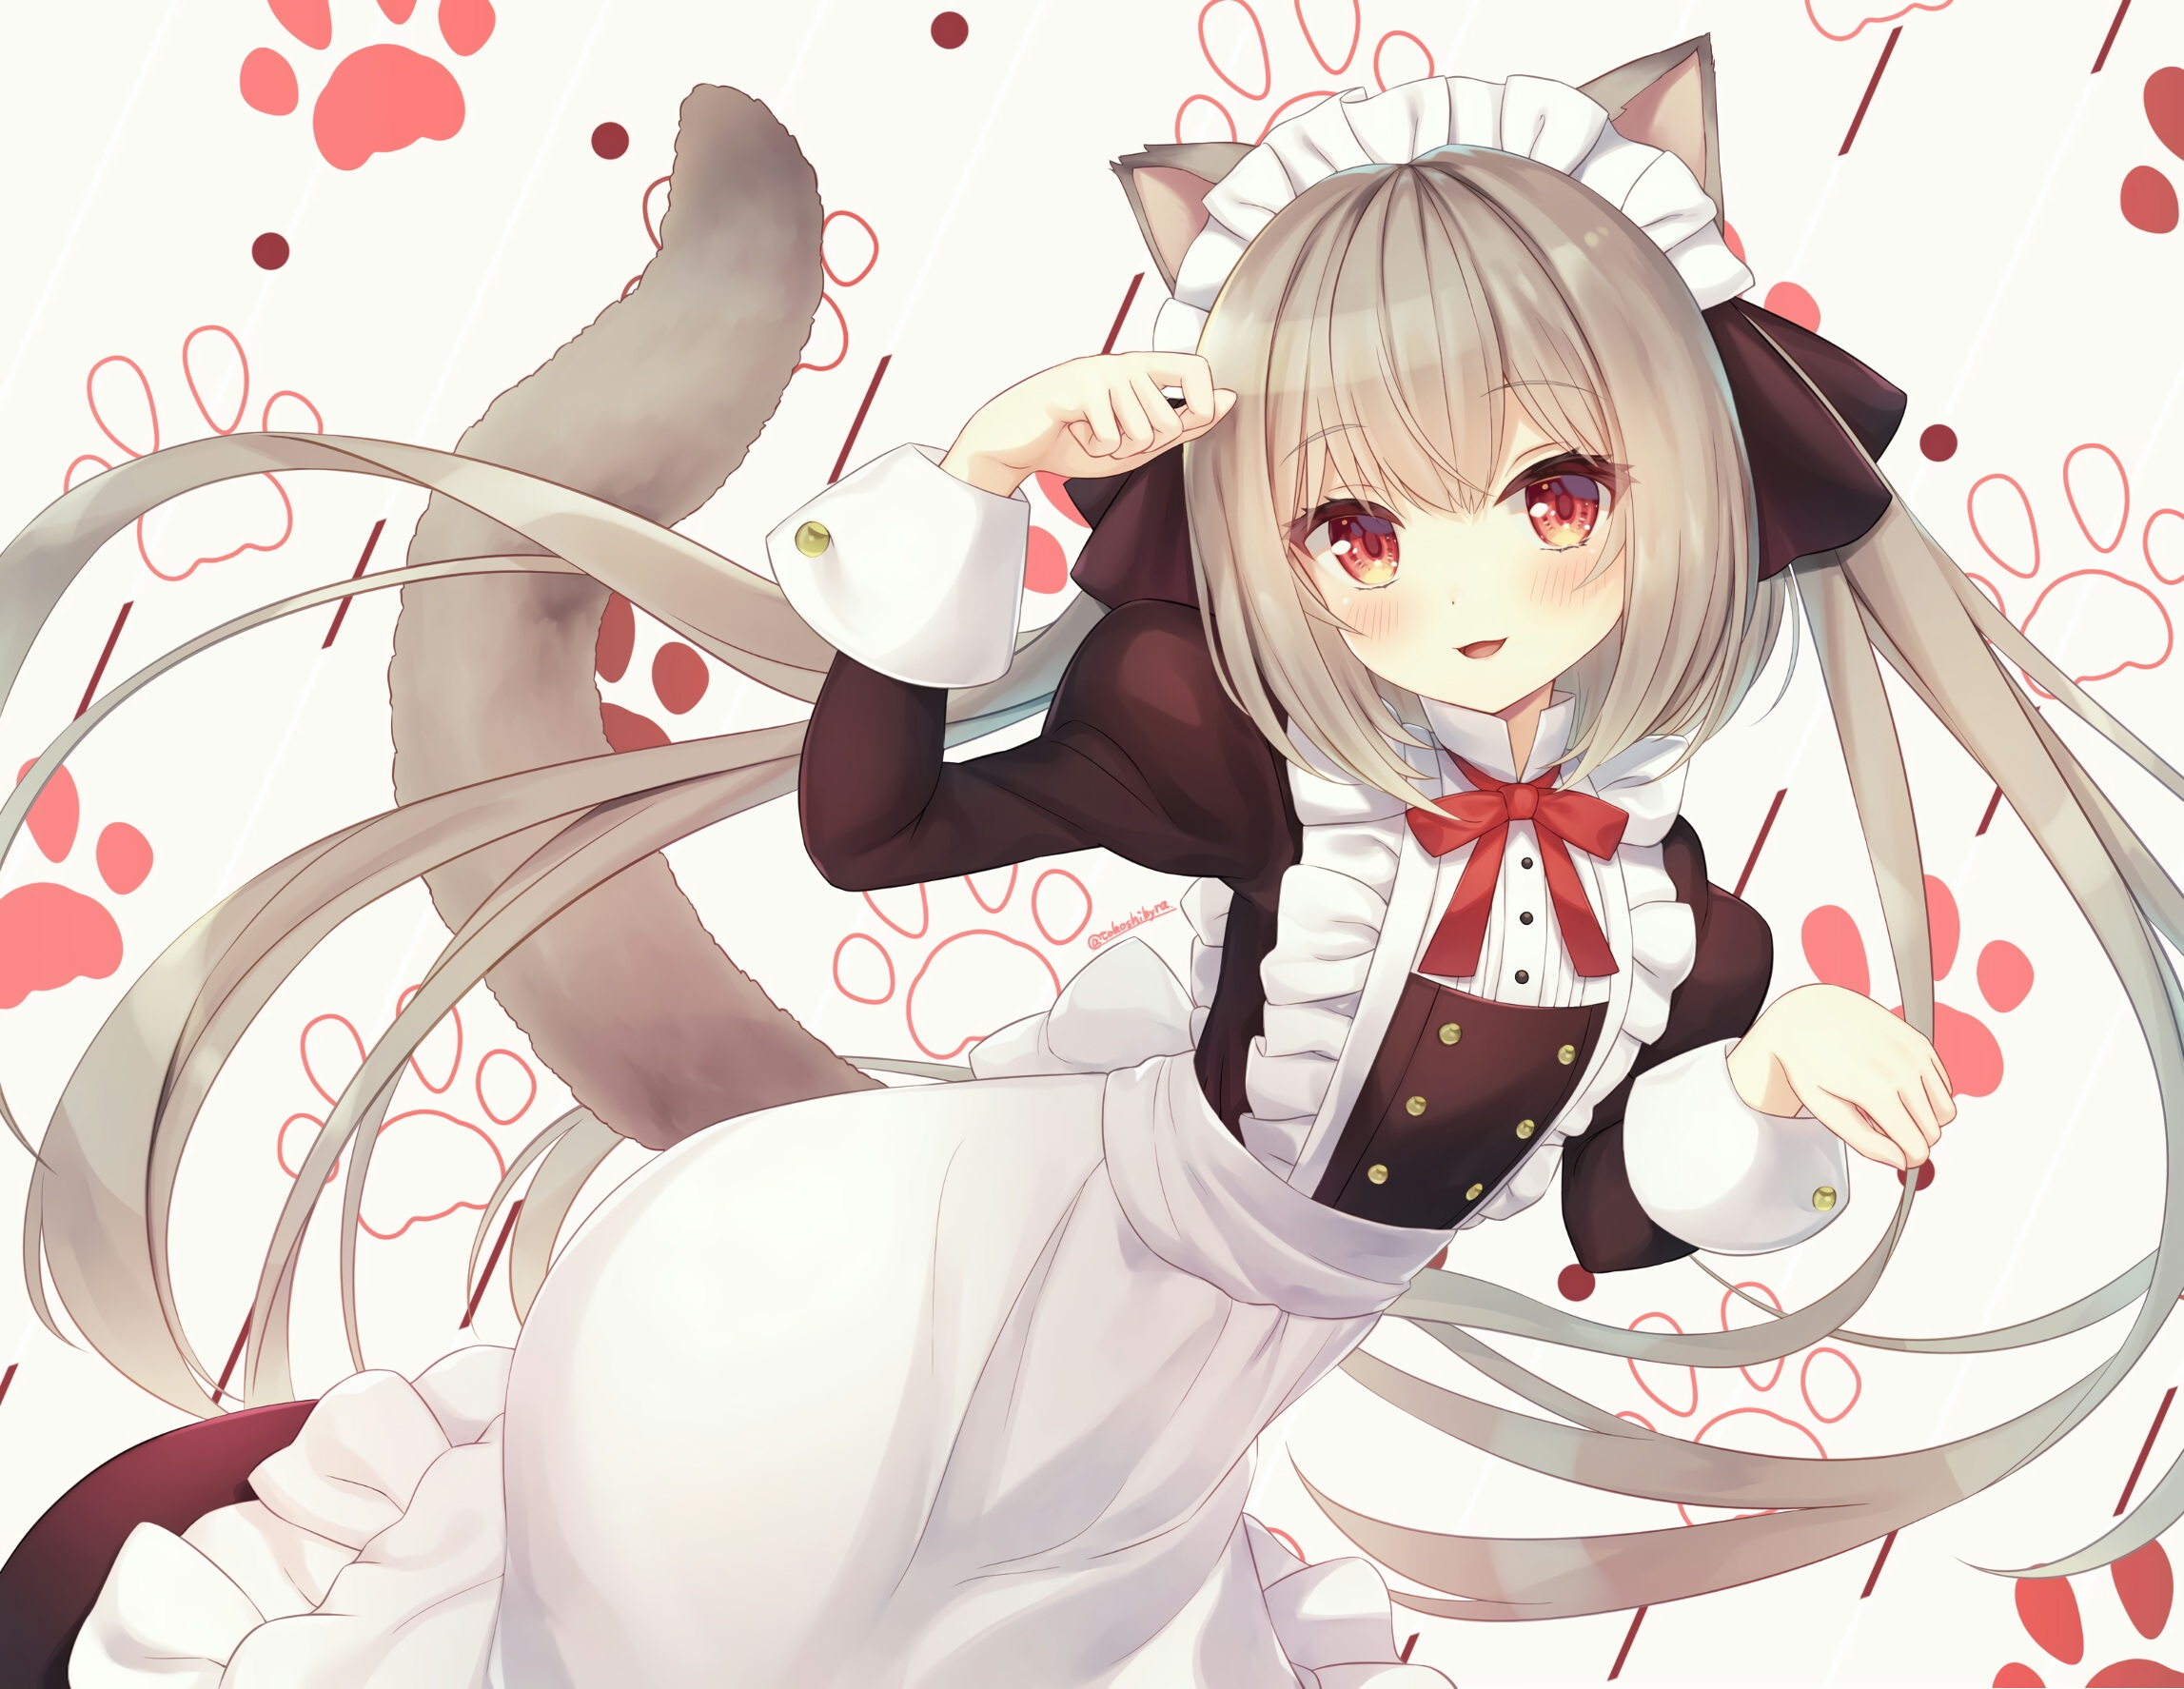 animal ears blush catgirl guitar instrument k-on! nakano